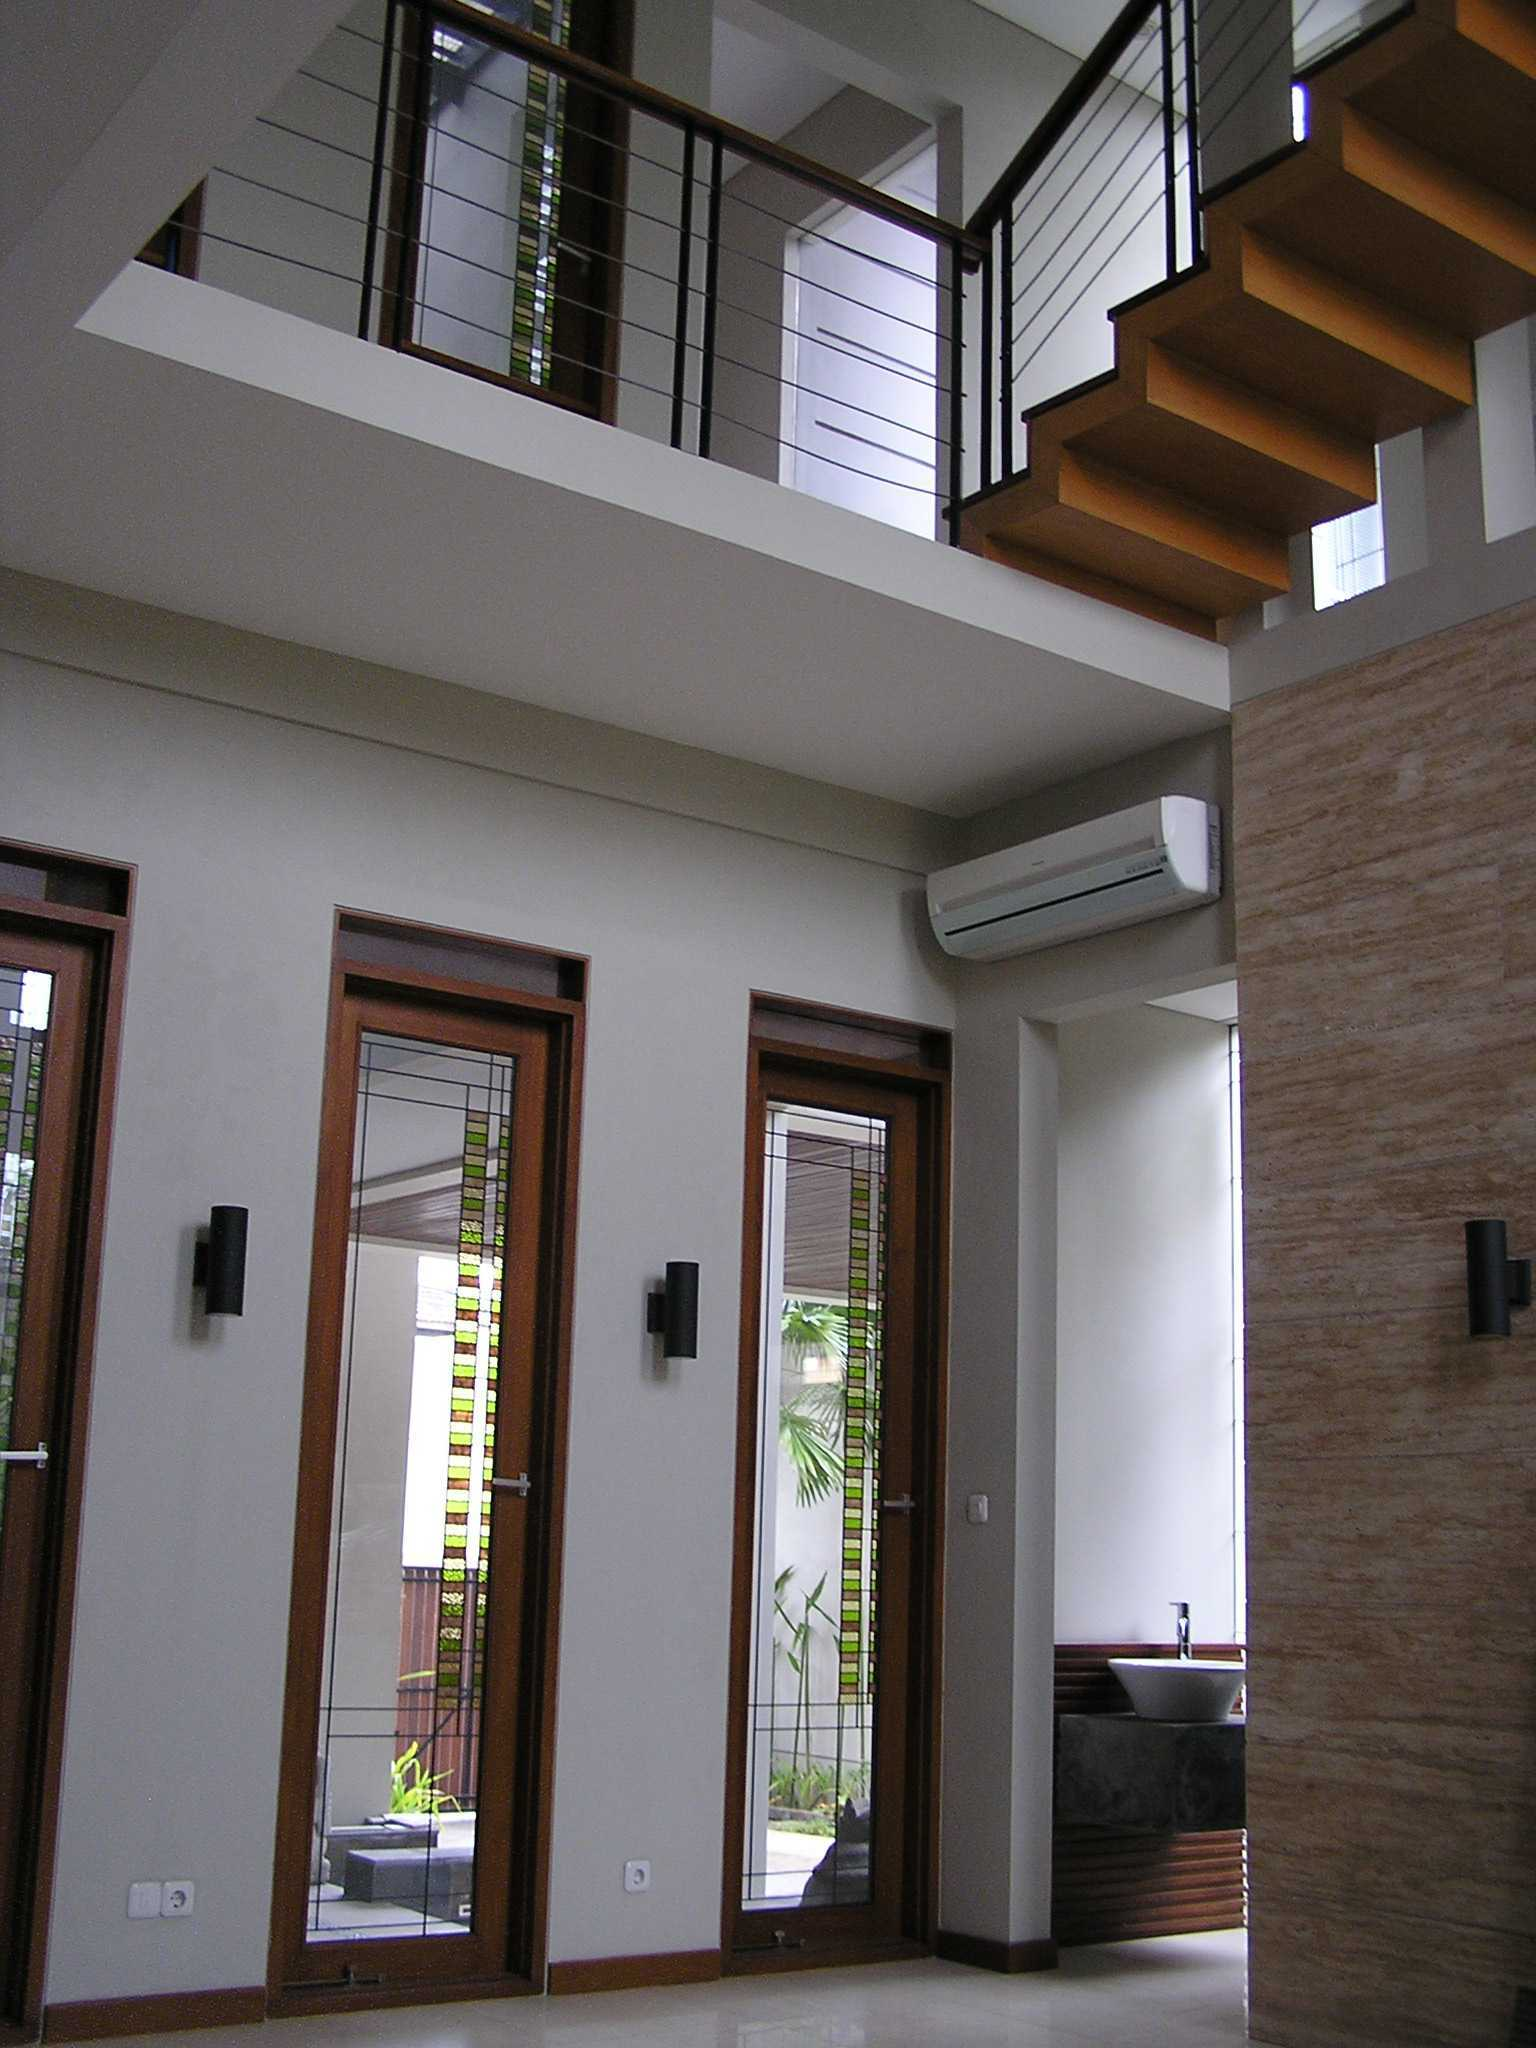 Pt. Garisprada Tomang Residence Tomang, Grogol Petamburan, West Jakarta City, Jakarta, Indonesia Tomang Interior Modern  22234